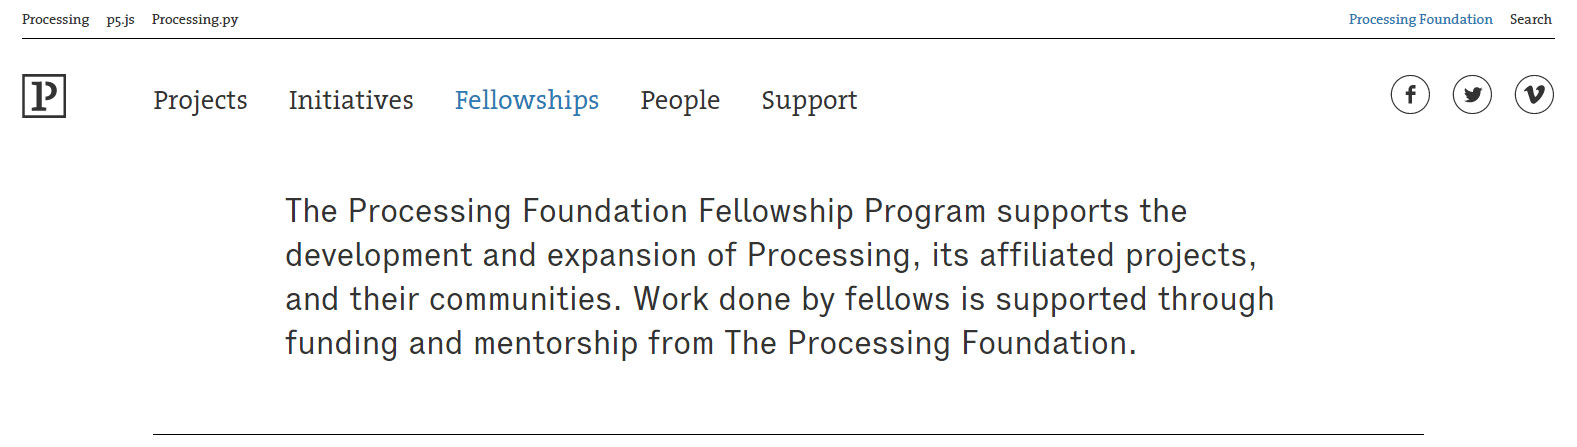 processing-foundation